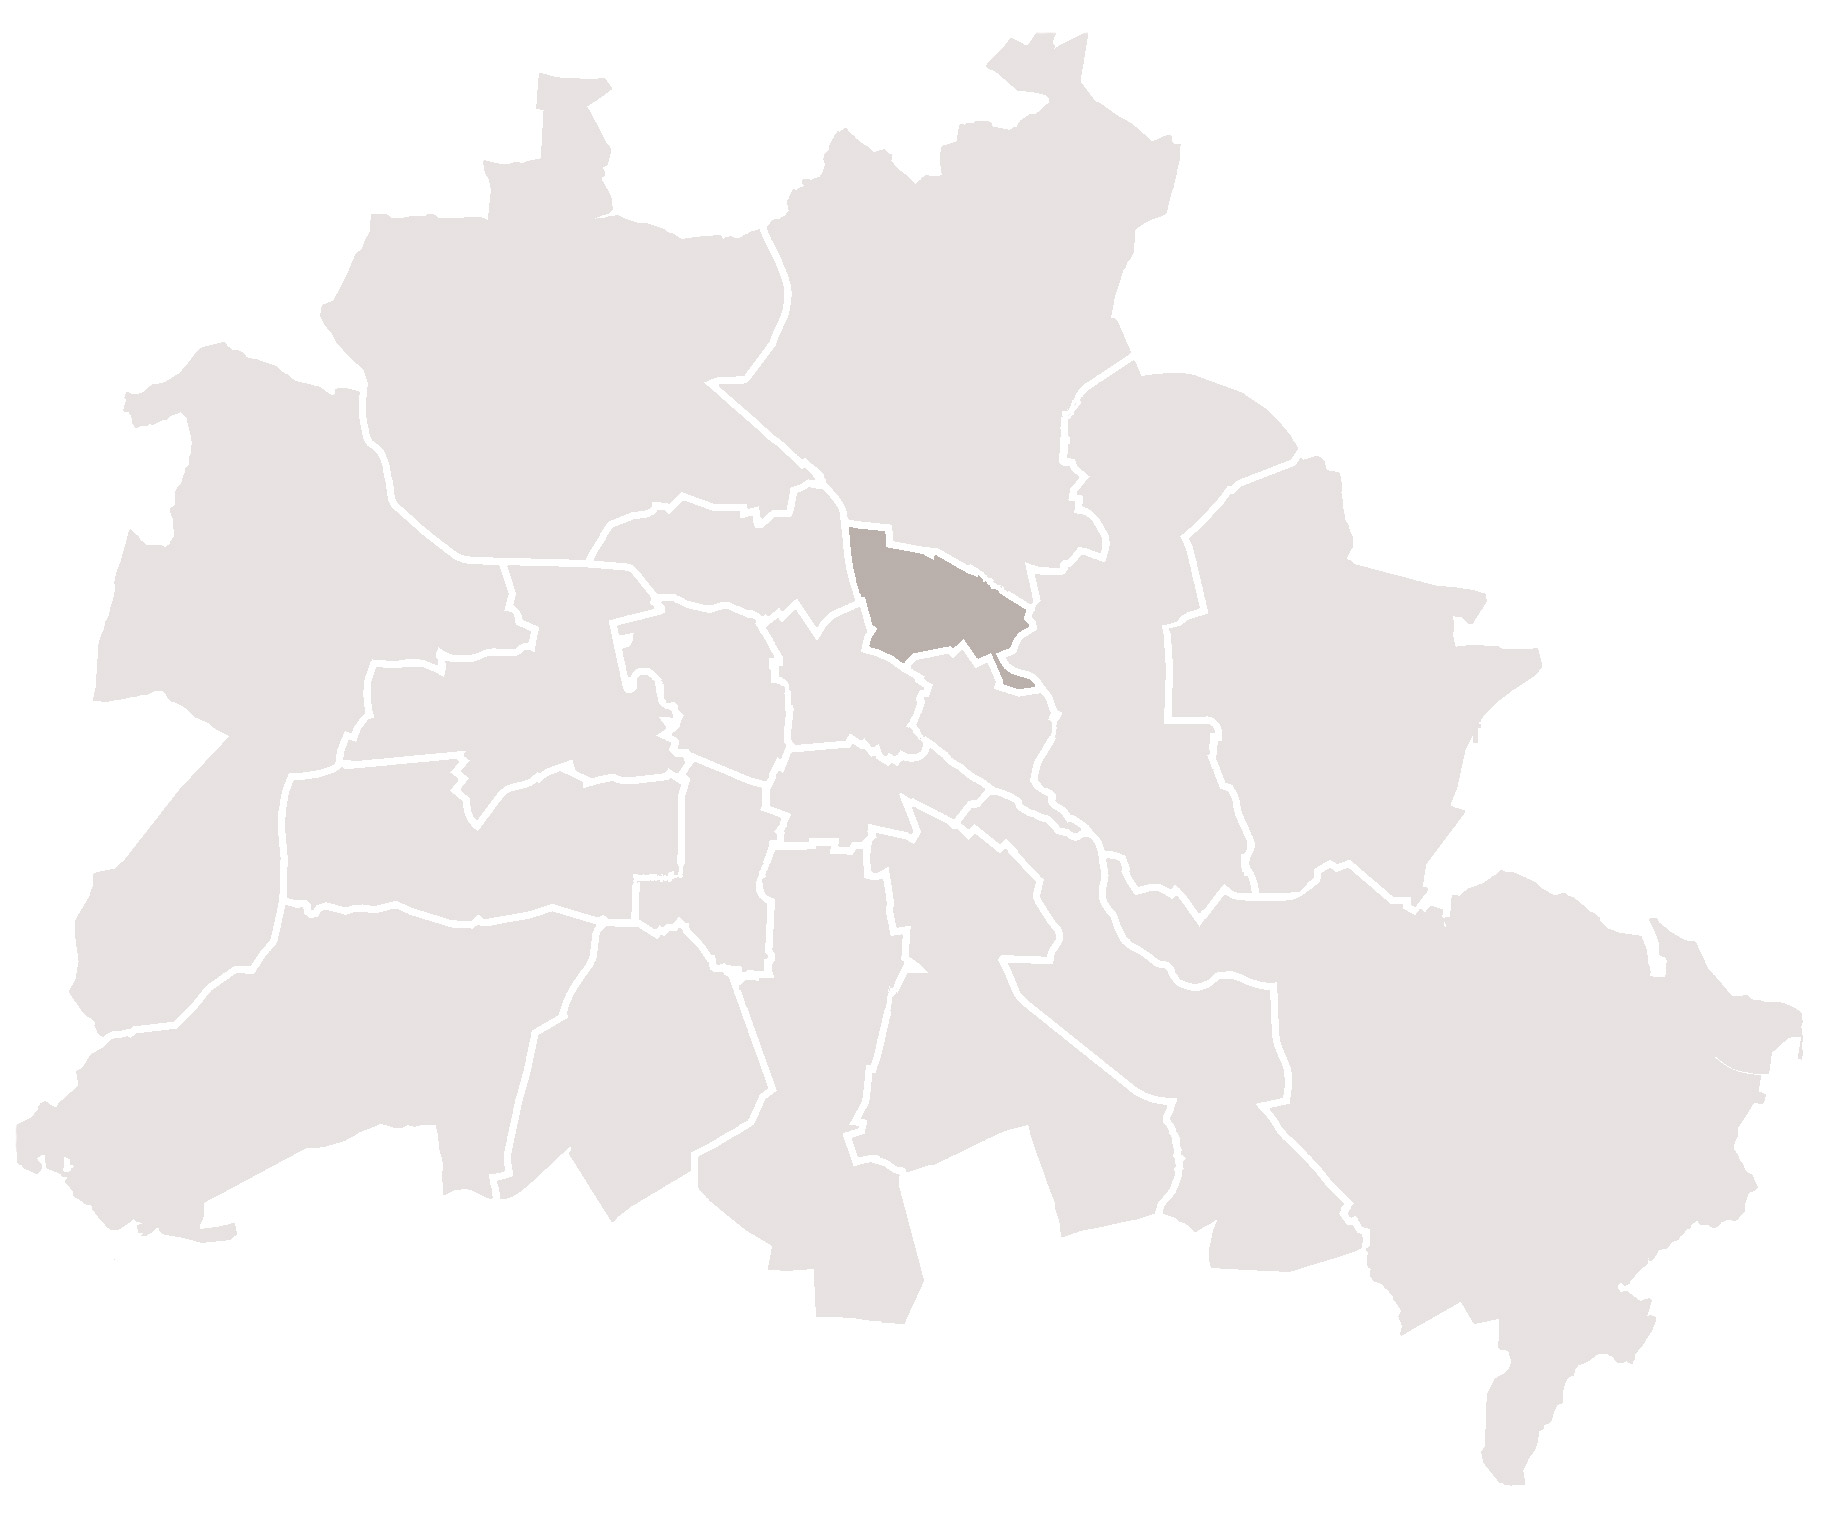 Berlin Prenzlauer Berg Karte